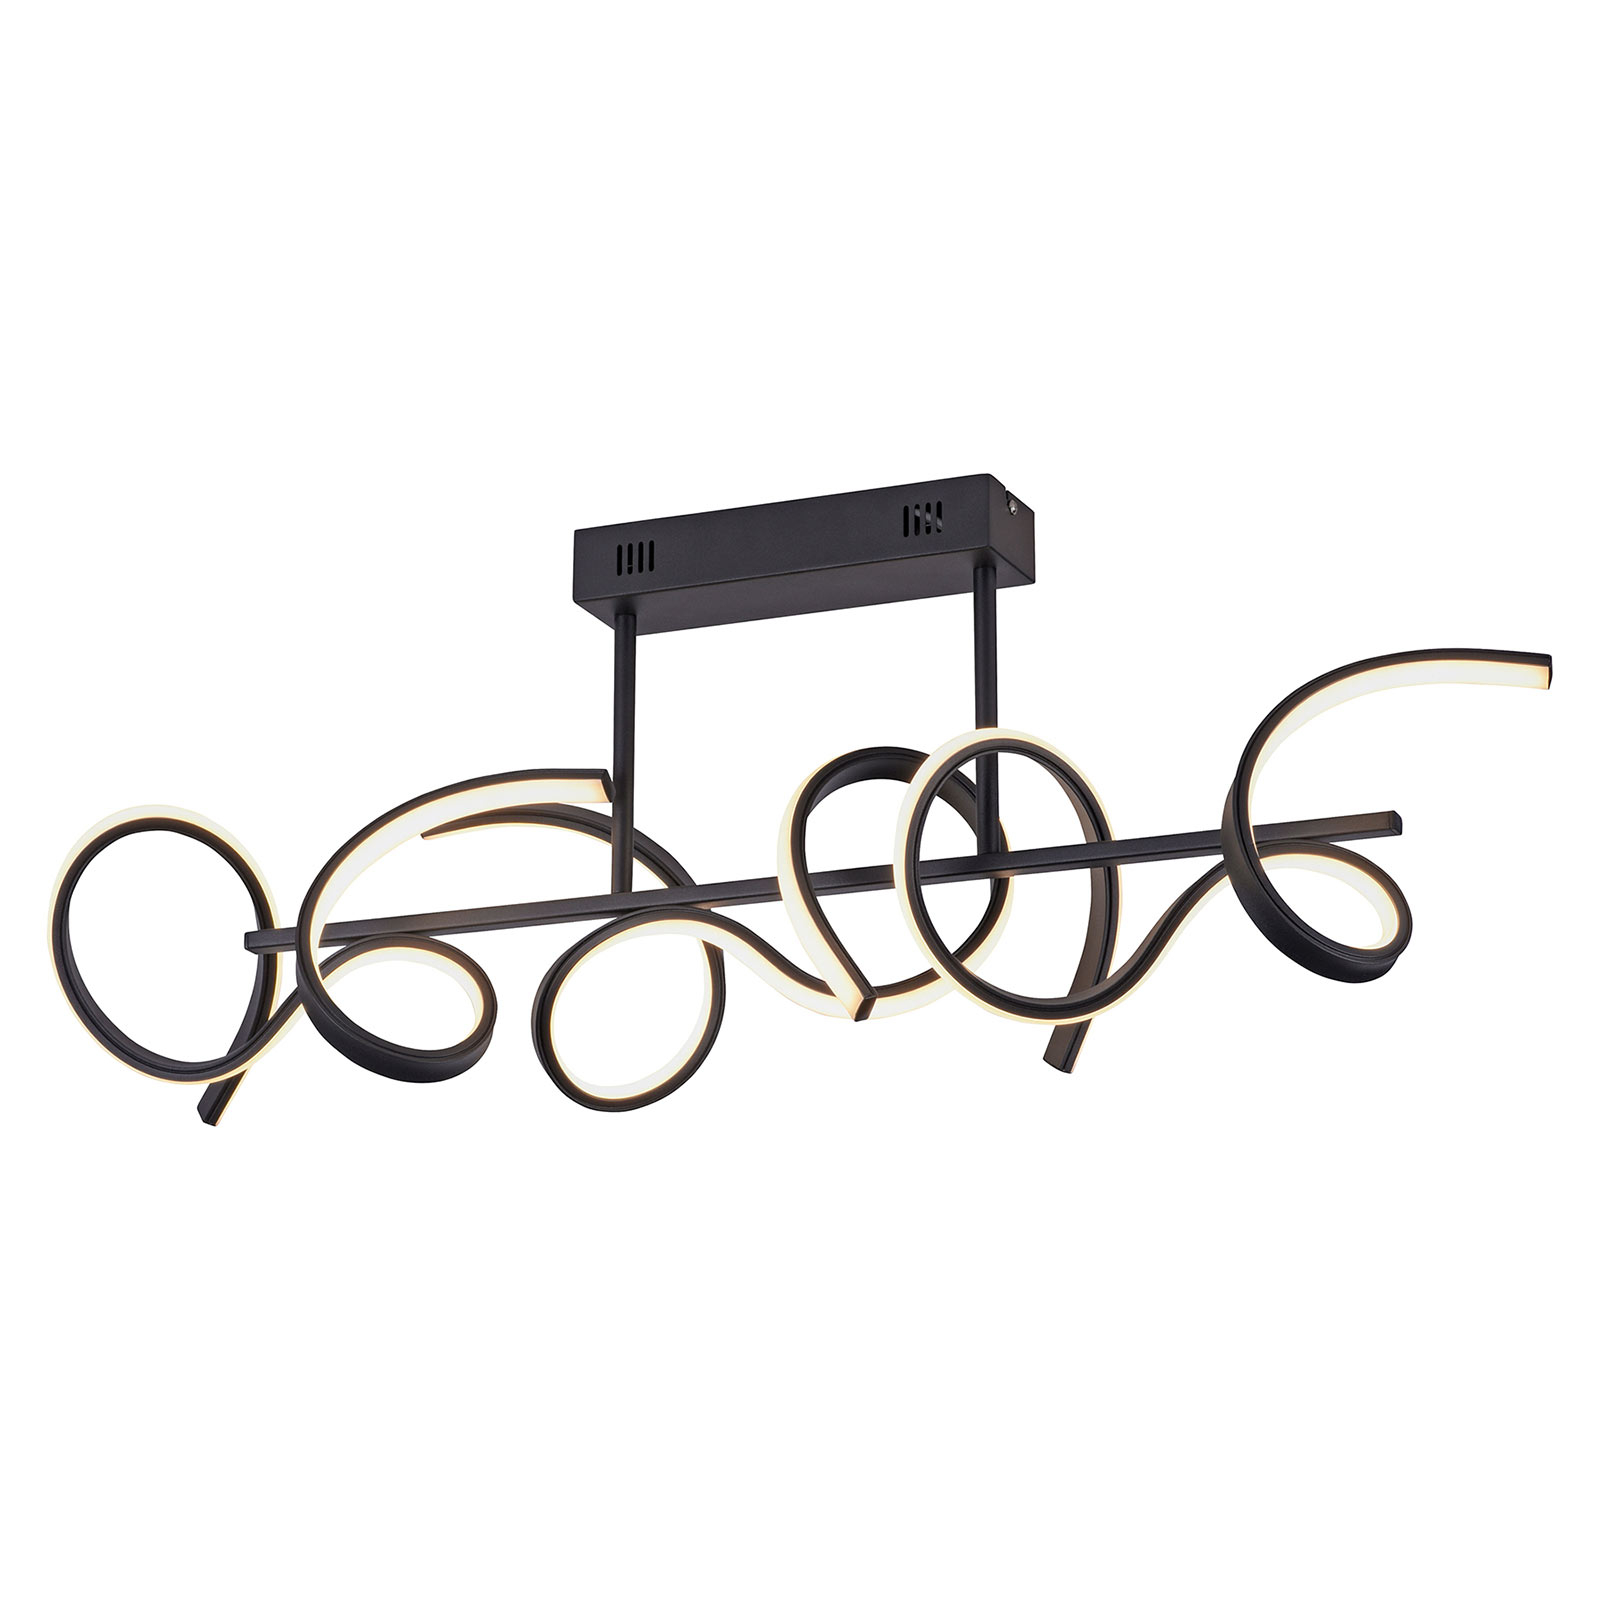 Curls LED-taklampe, svart, dimbar